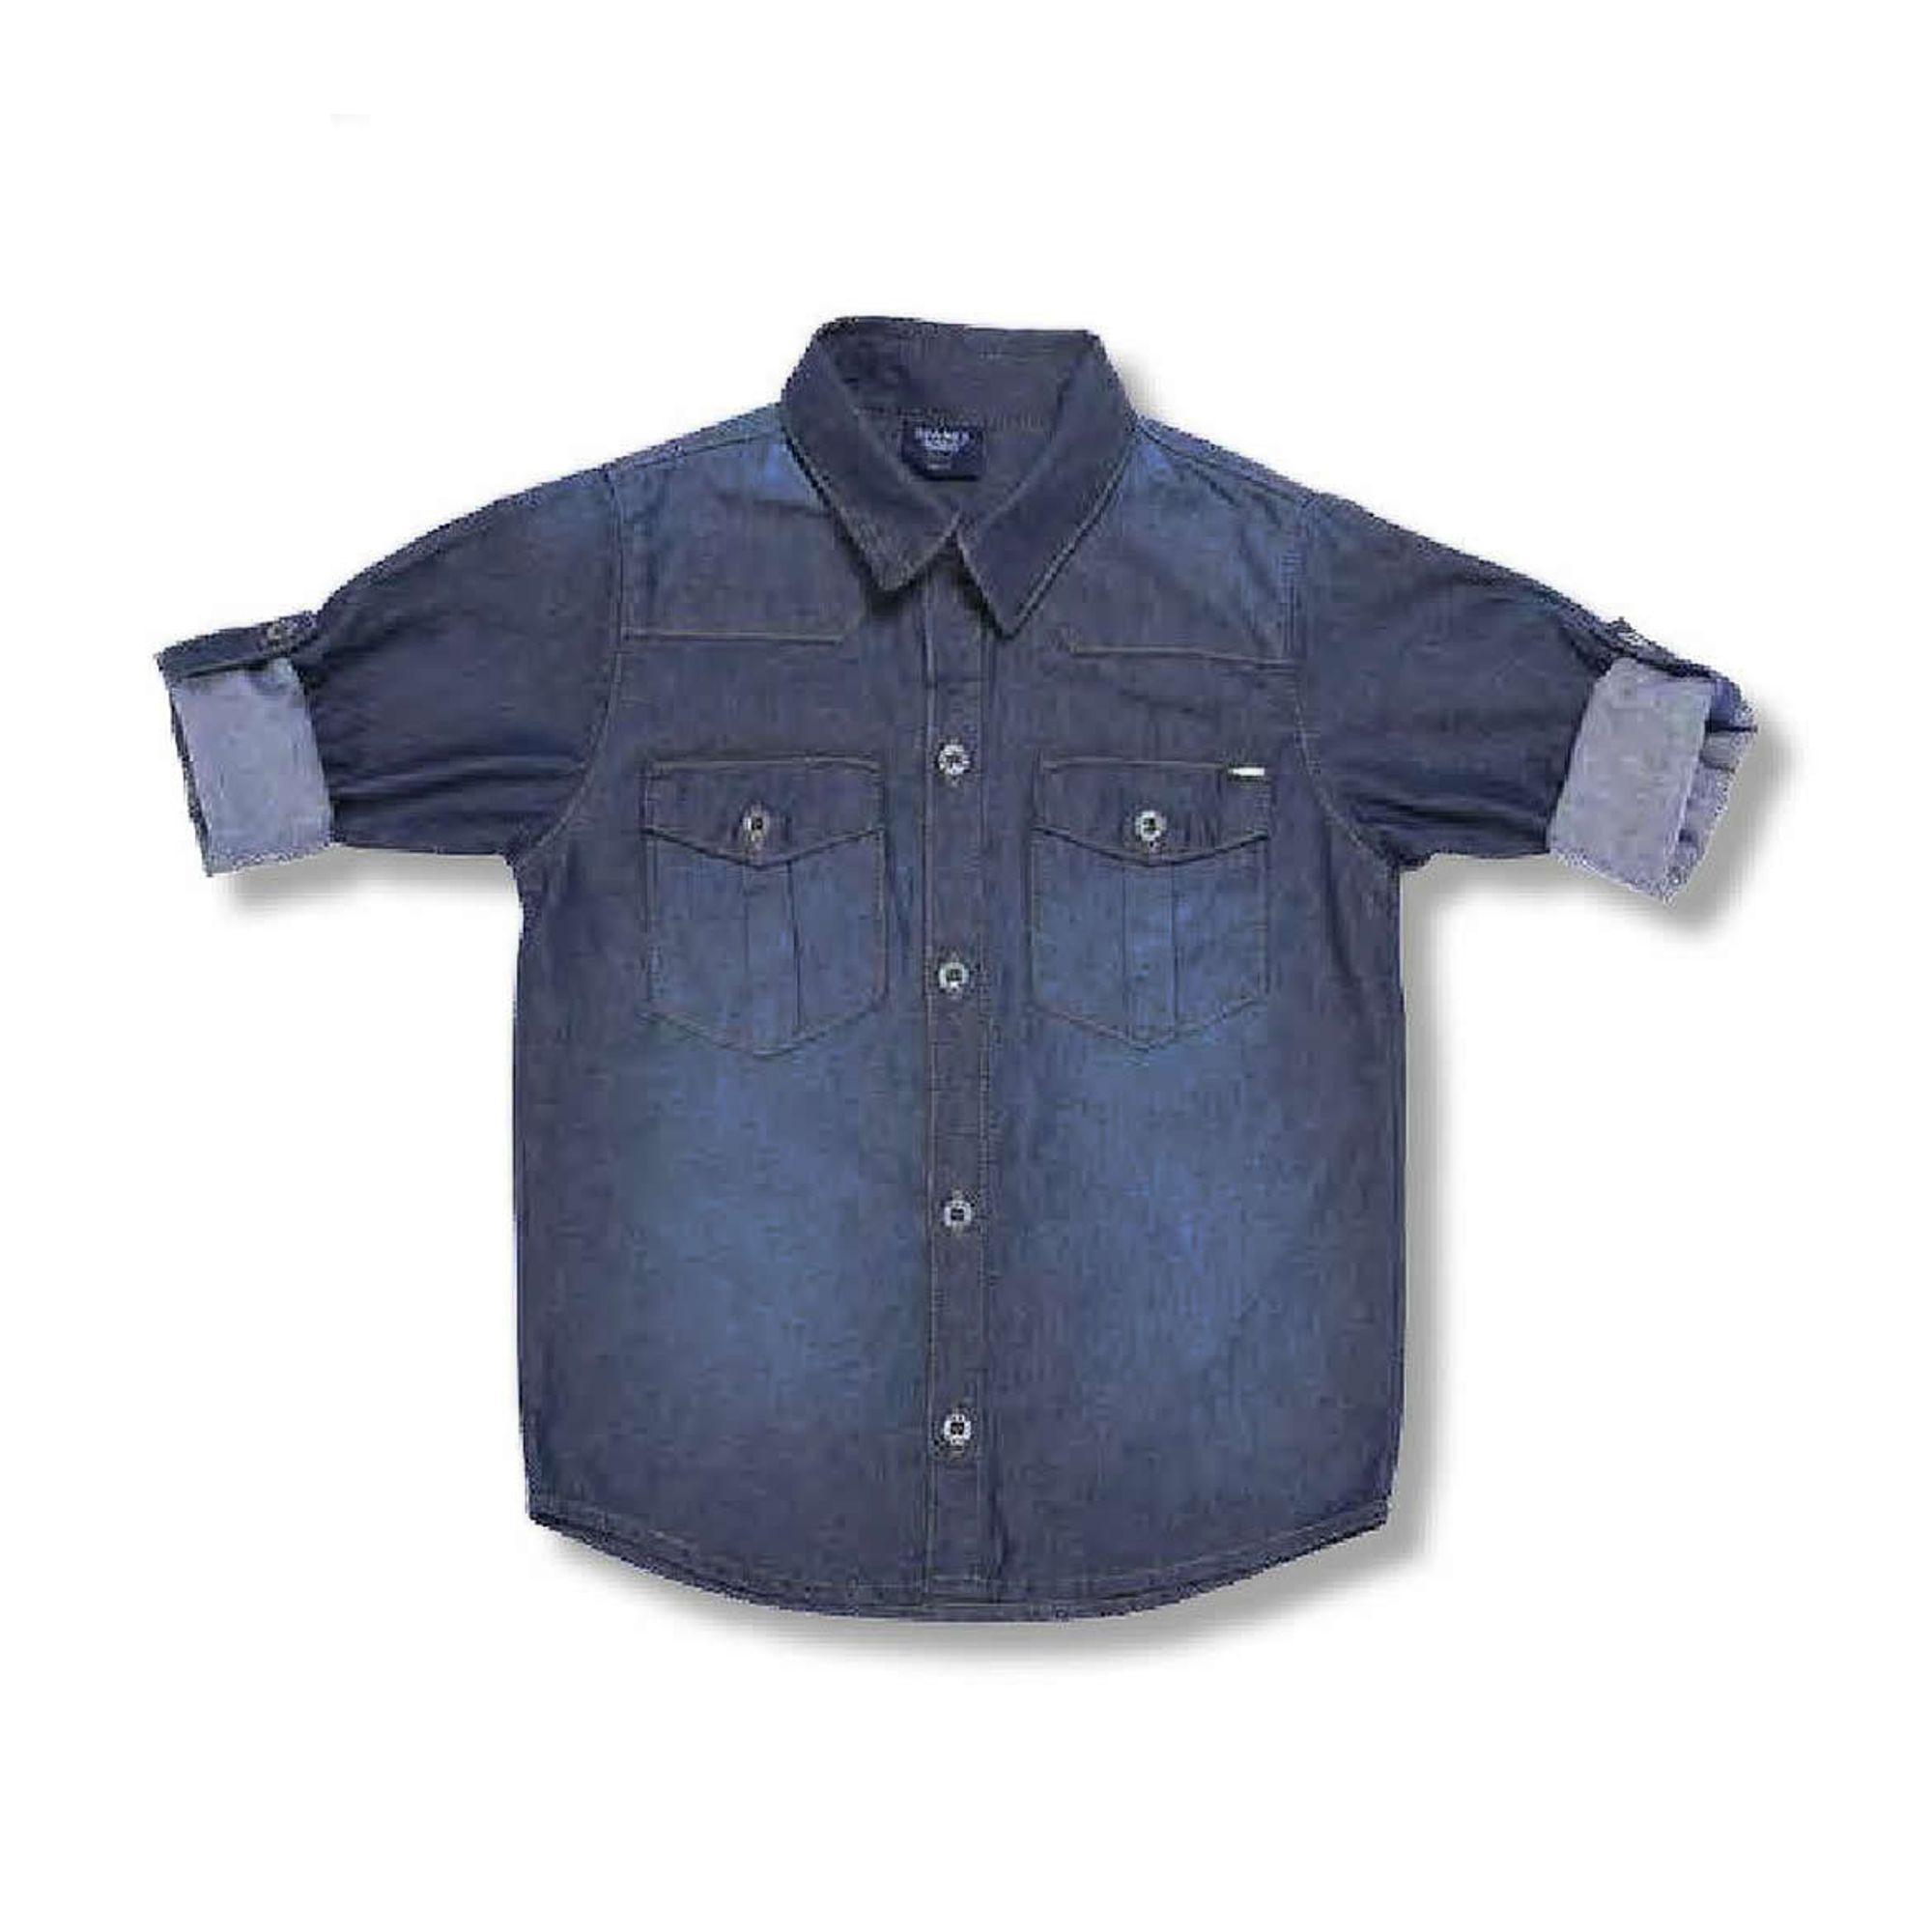 camisa-jeans-menino-manga-longa-desbotada-mania-kids